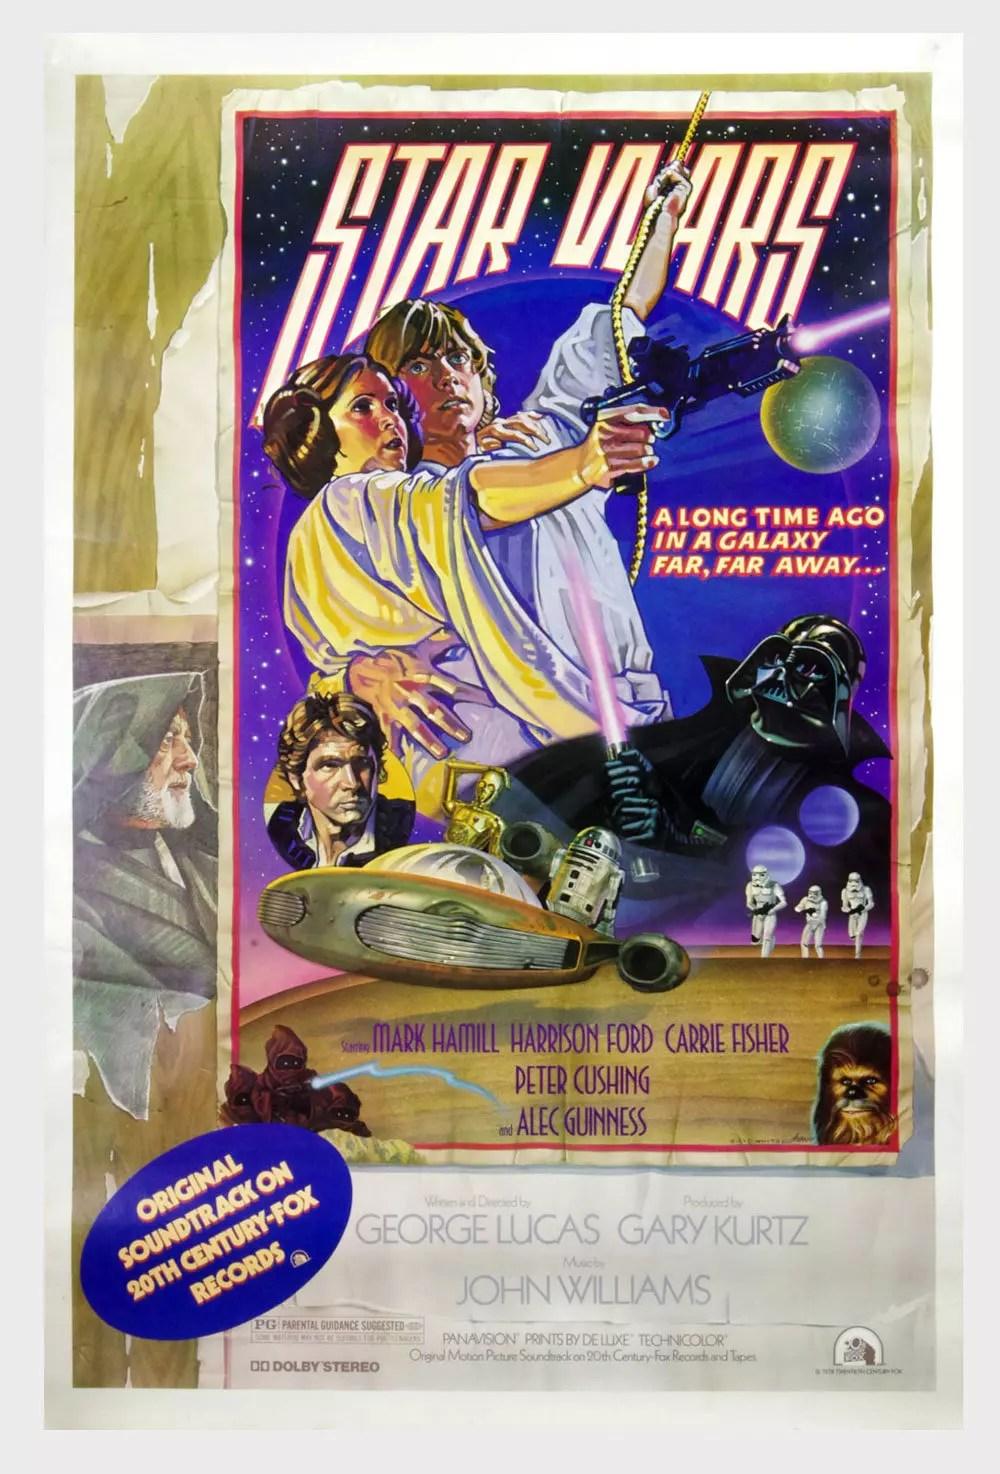 Star Wars A New Hope 1978  Soundtrack Album Promo Poster 27 x 41